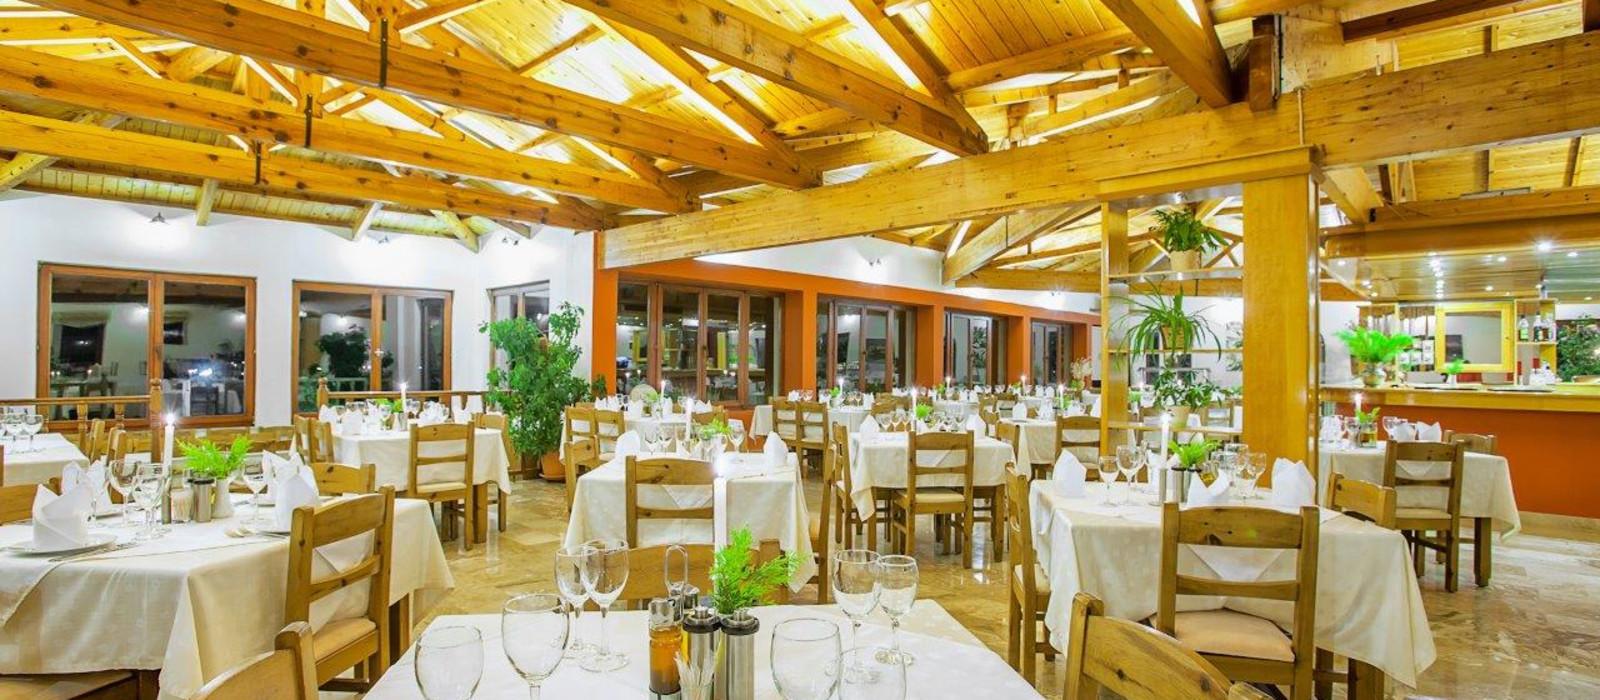 Hotel Europa  Olympia Griechenland